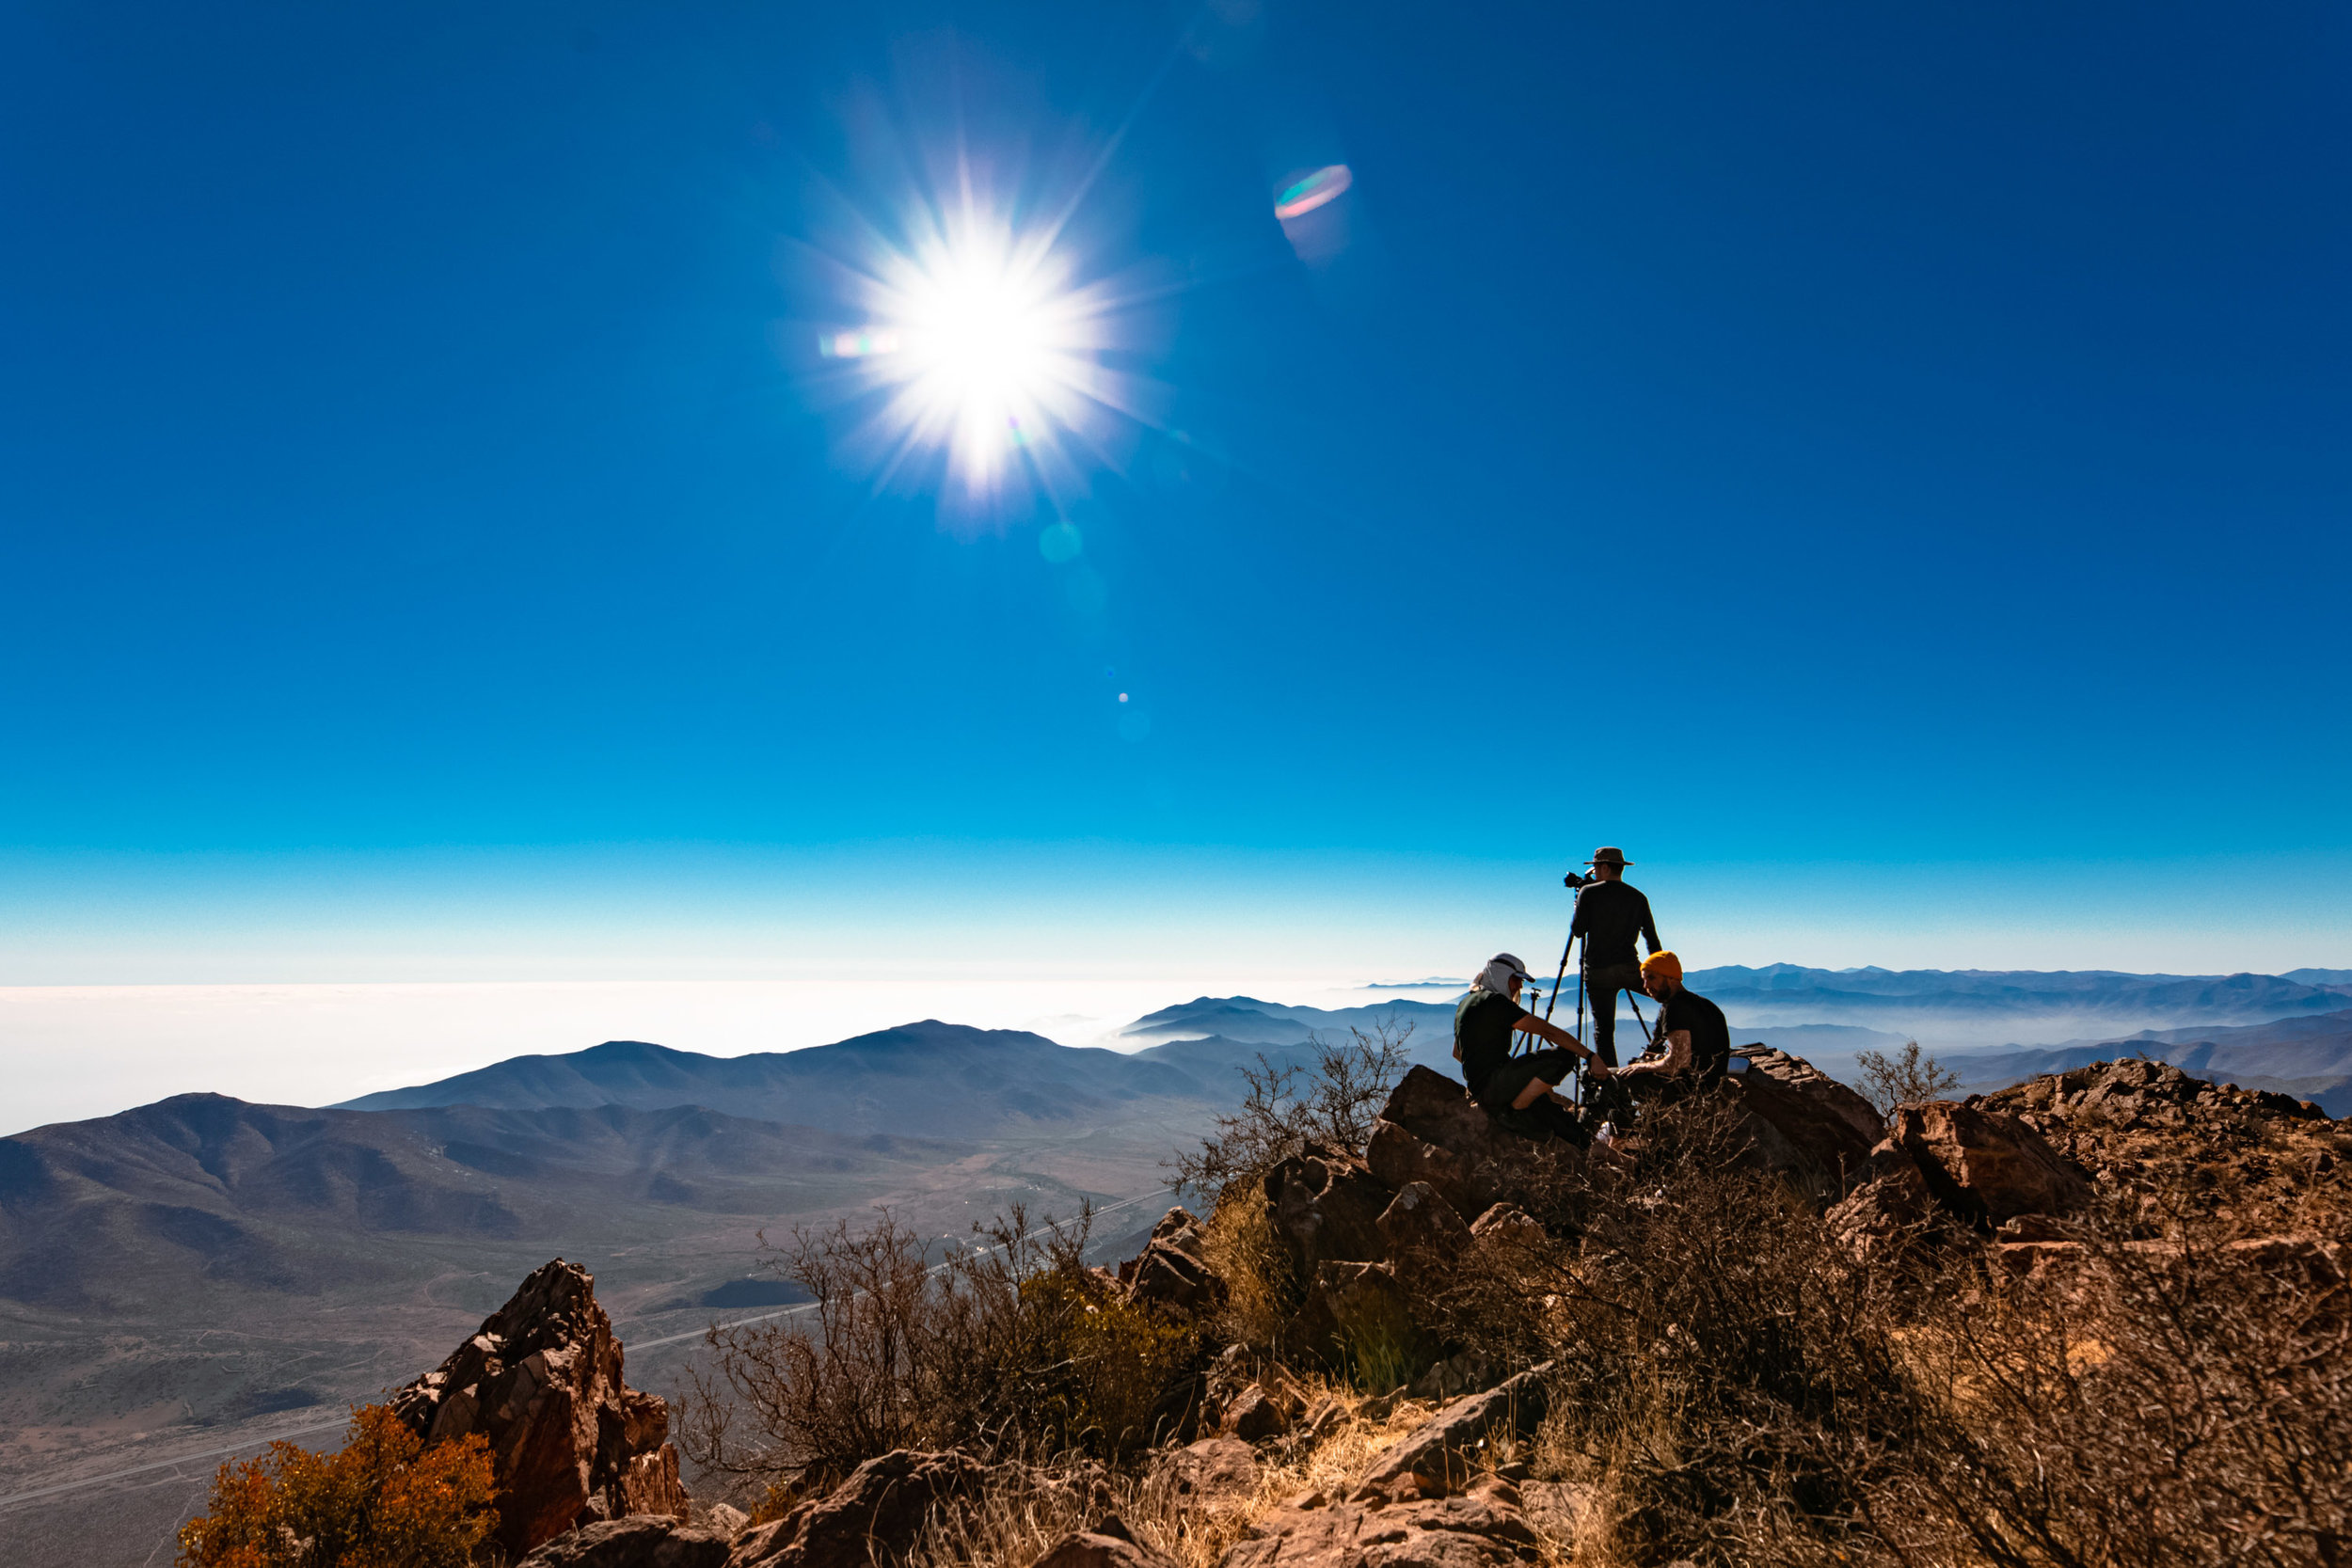 evanbdudley-Chile-Eclipse-19-0881.jpg